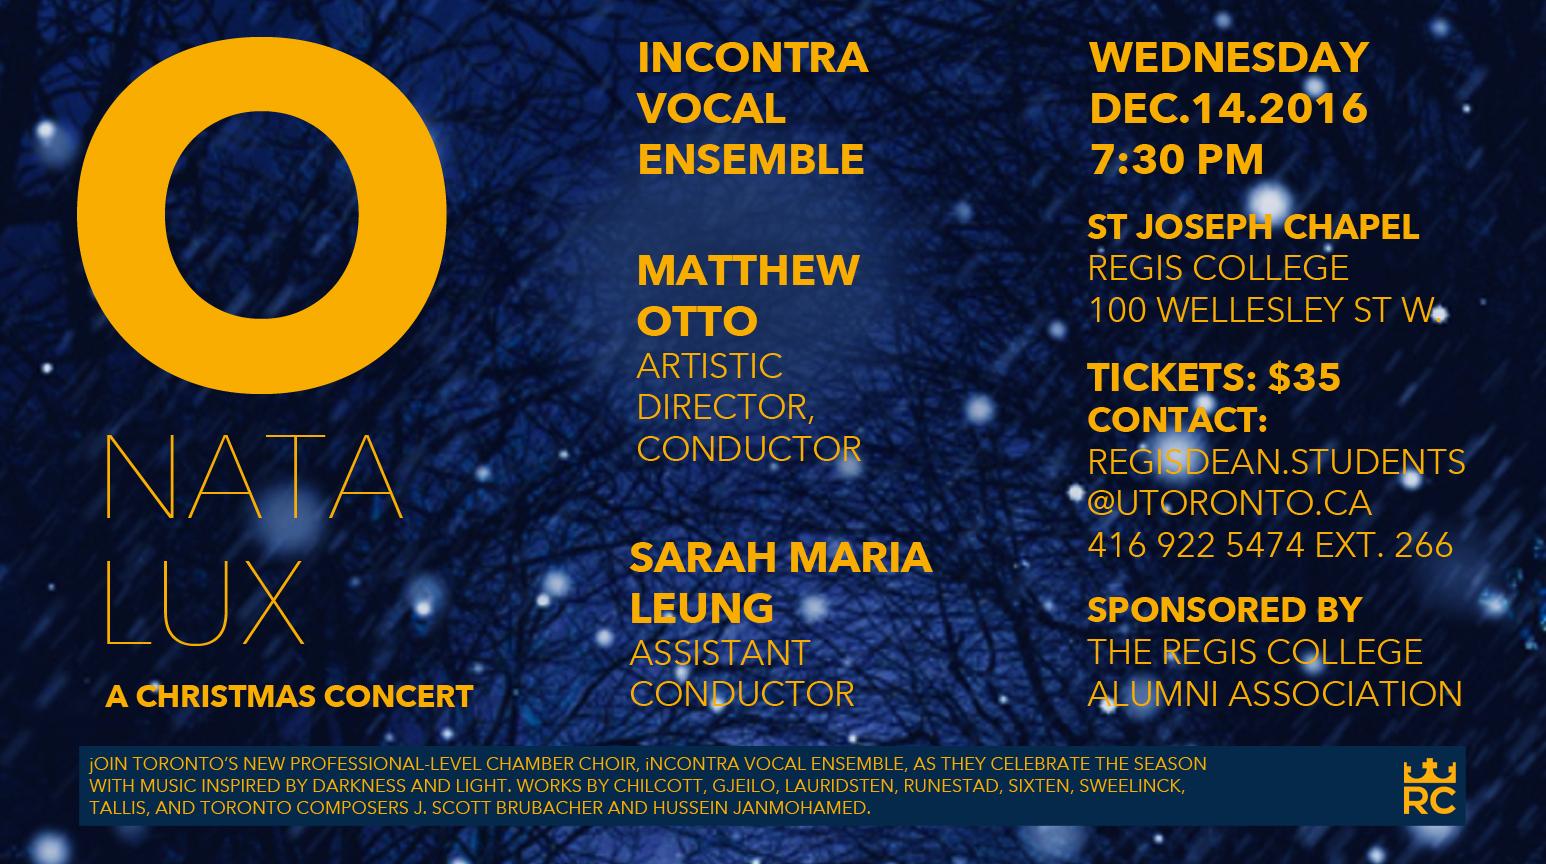 Regis College - Christmas Concert: O Nata Lux